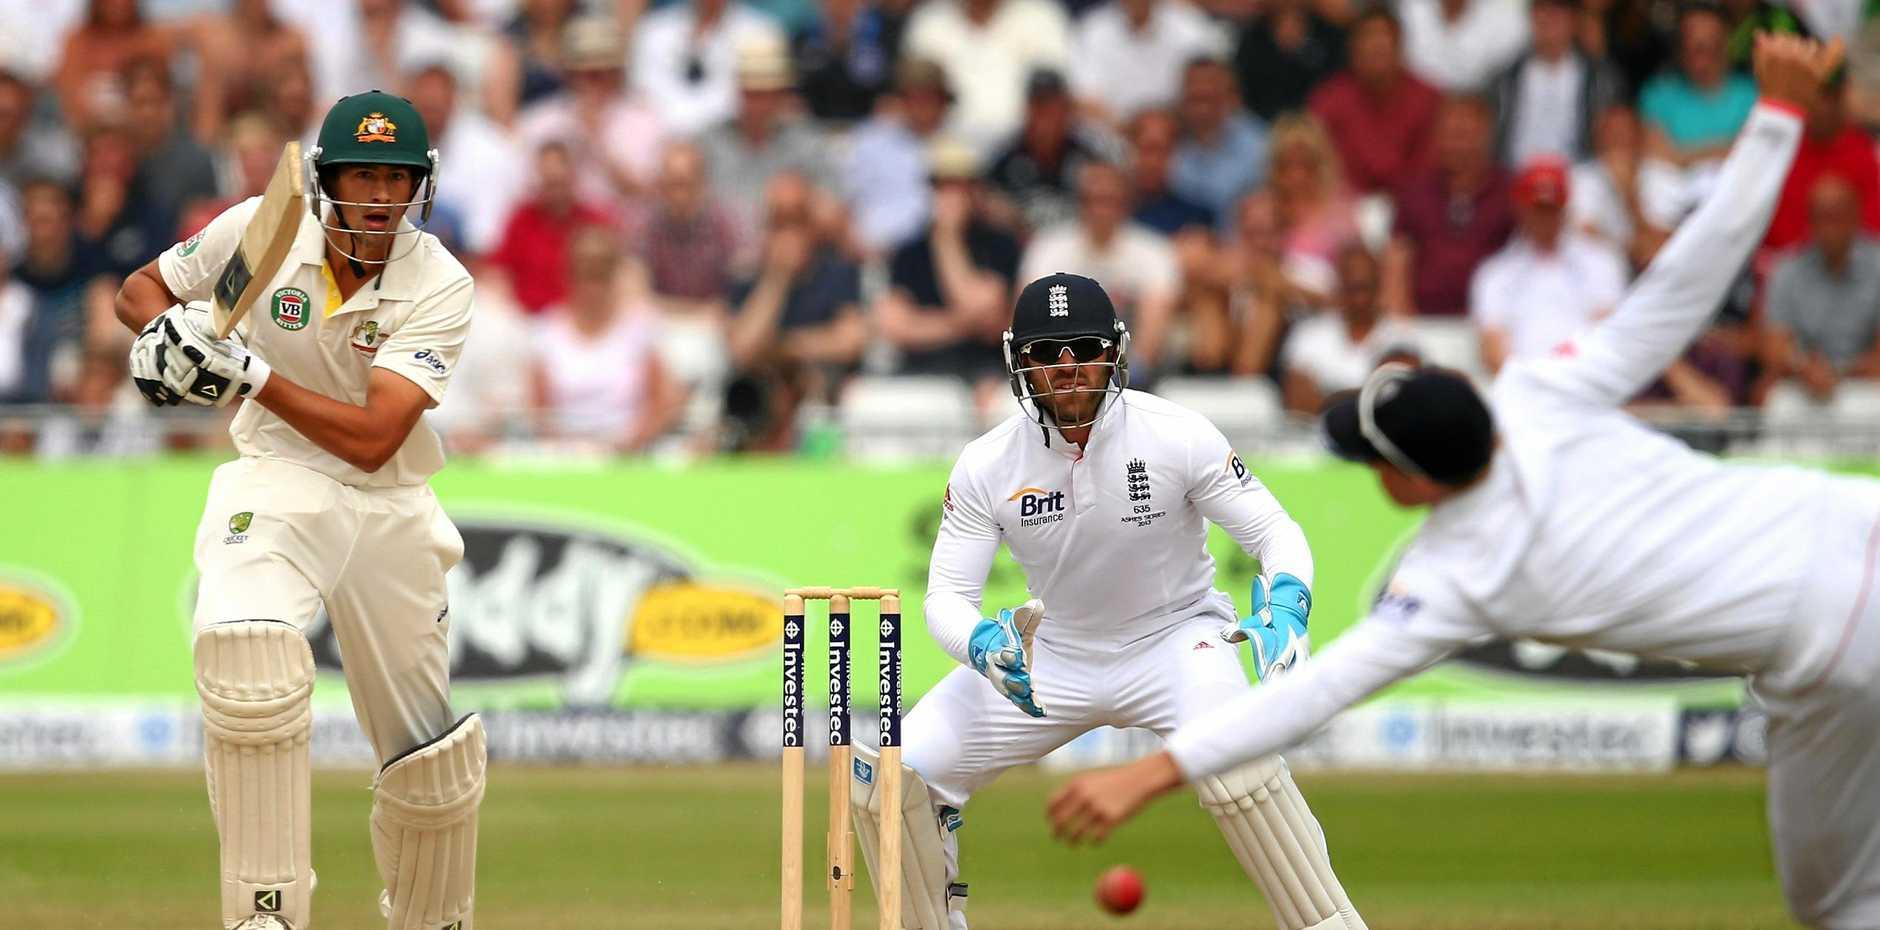 Ashton Agar was almost the hero for Australia at Trent Bridge Cricket in 2013.